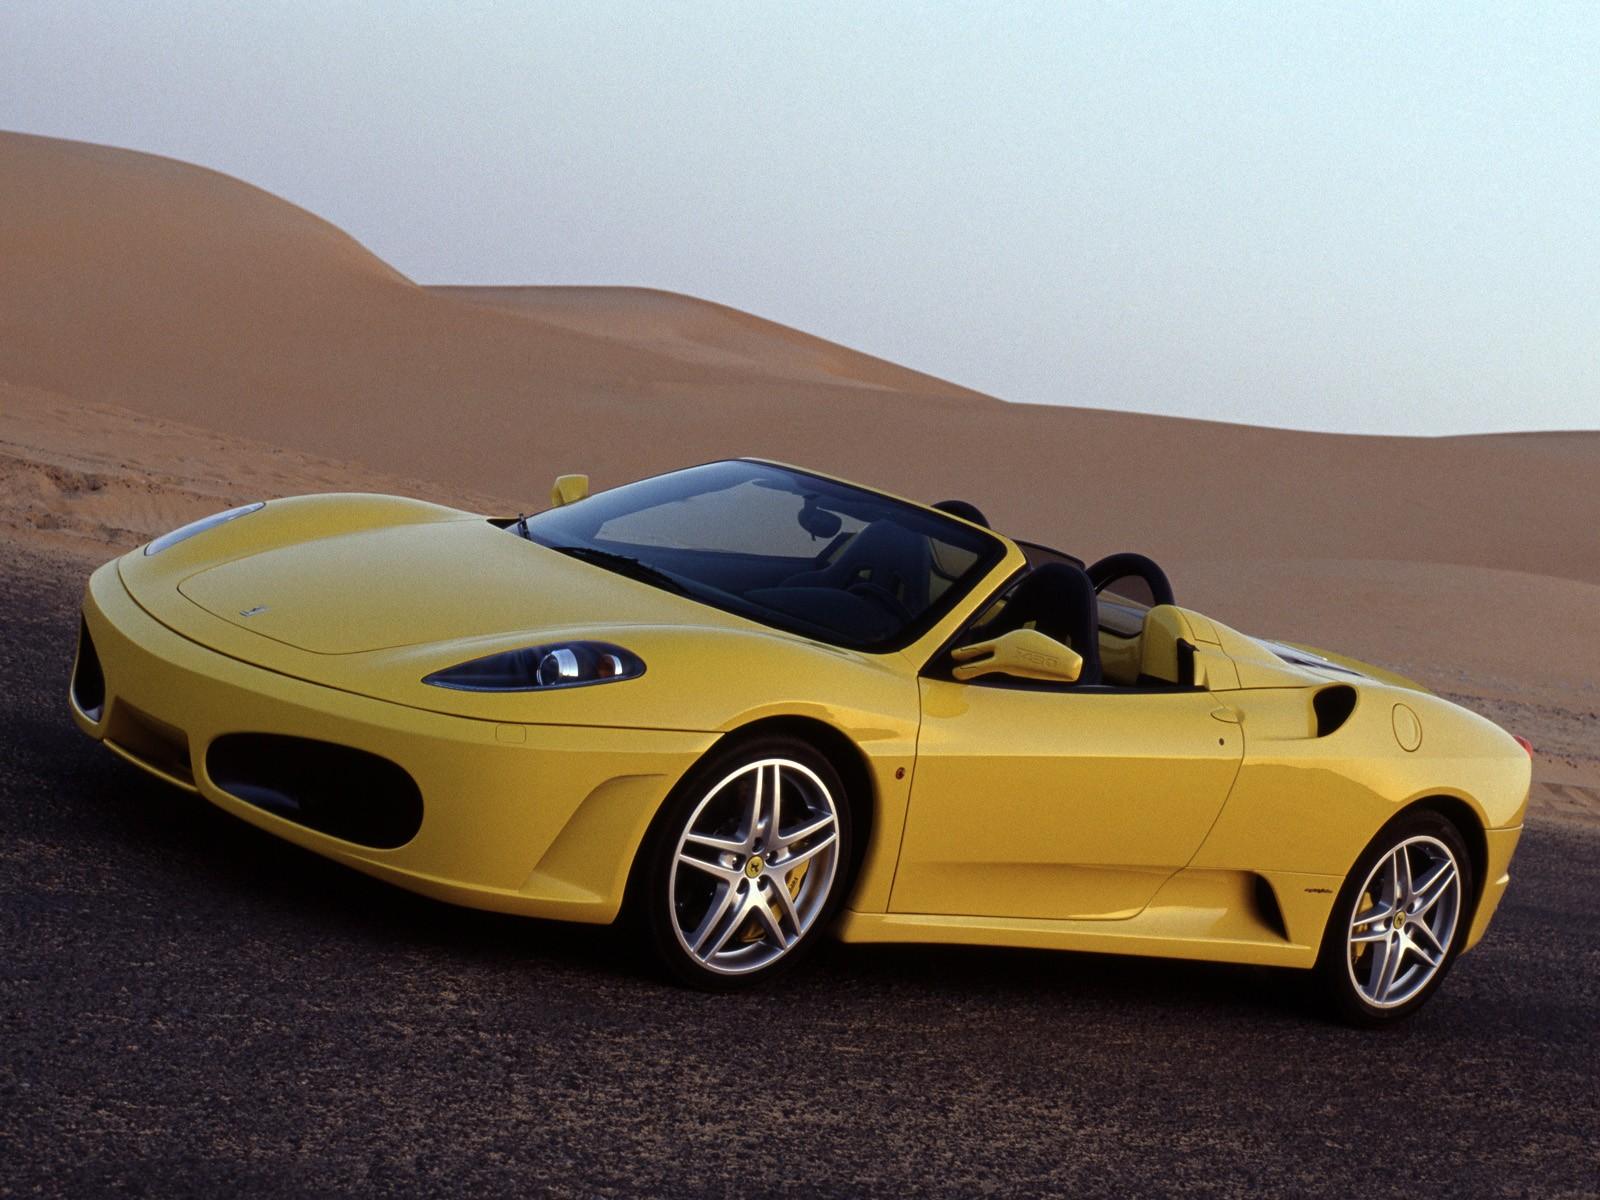 http://www.automobilesreview.com/gallery/ferrari-f430/ferrari-f430spyder-007.jpg